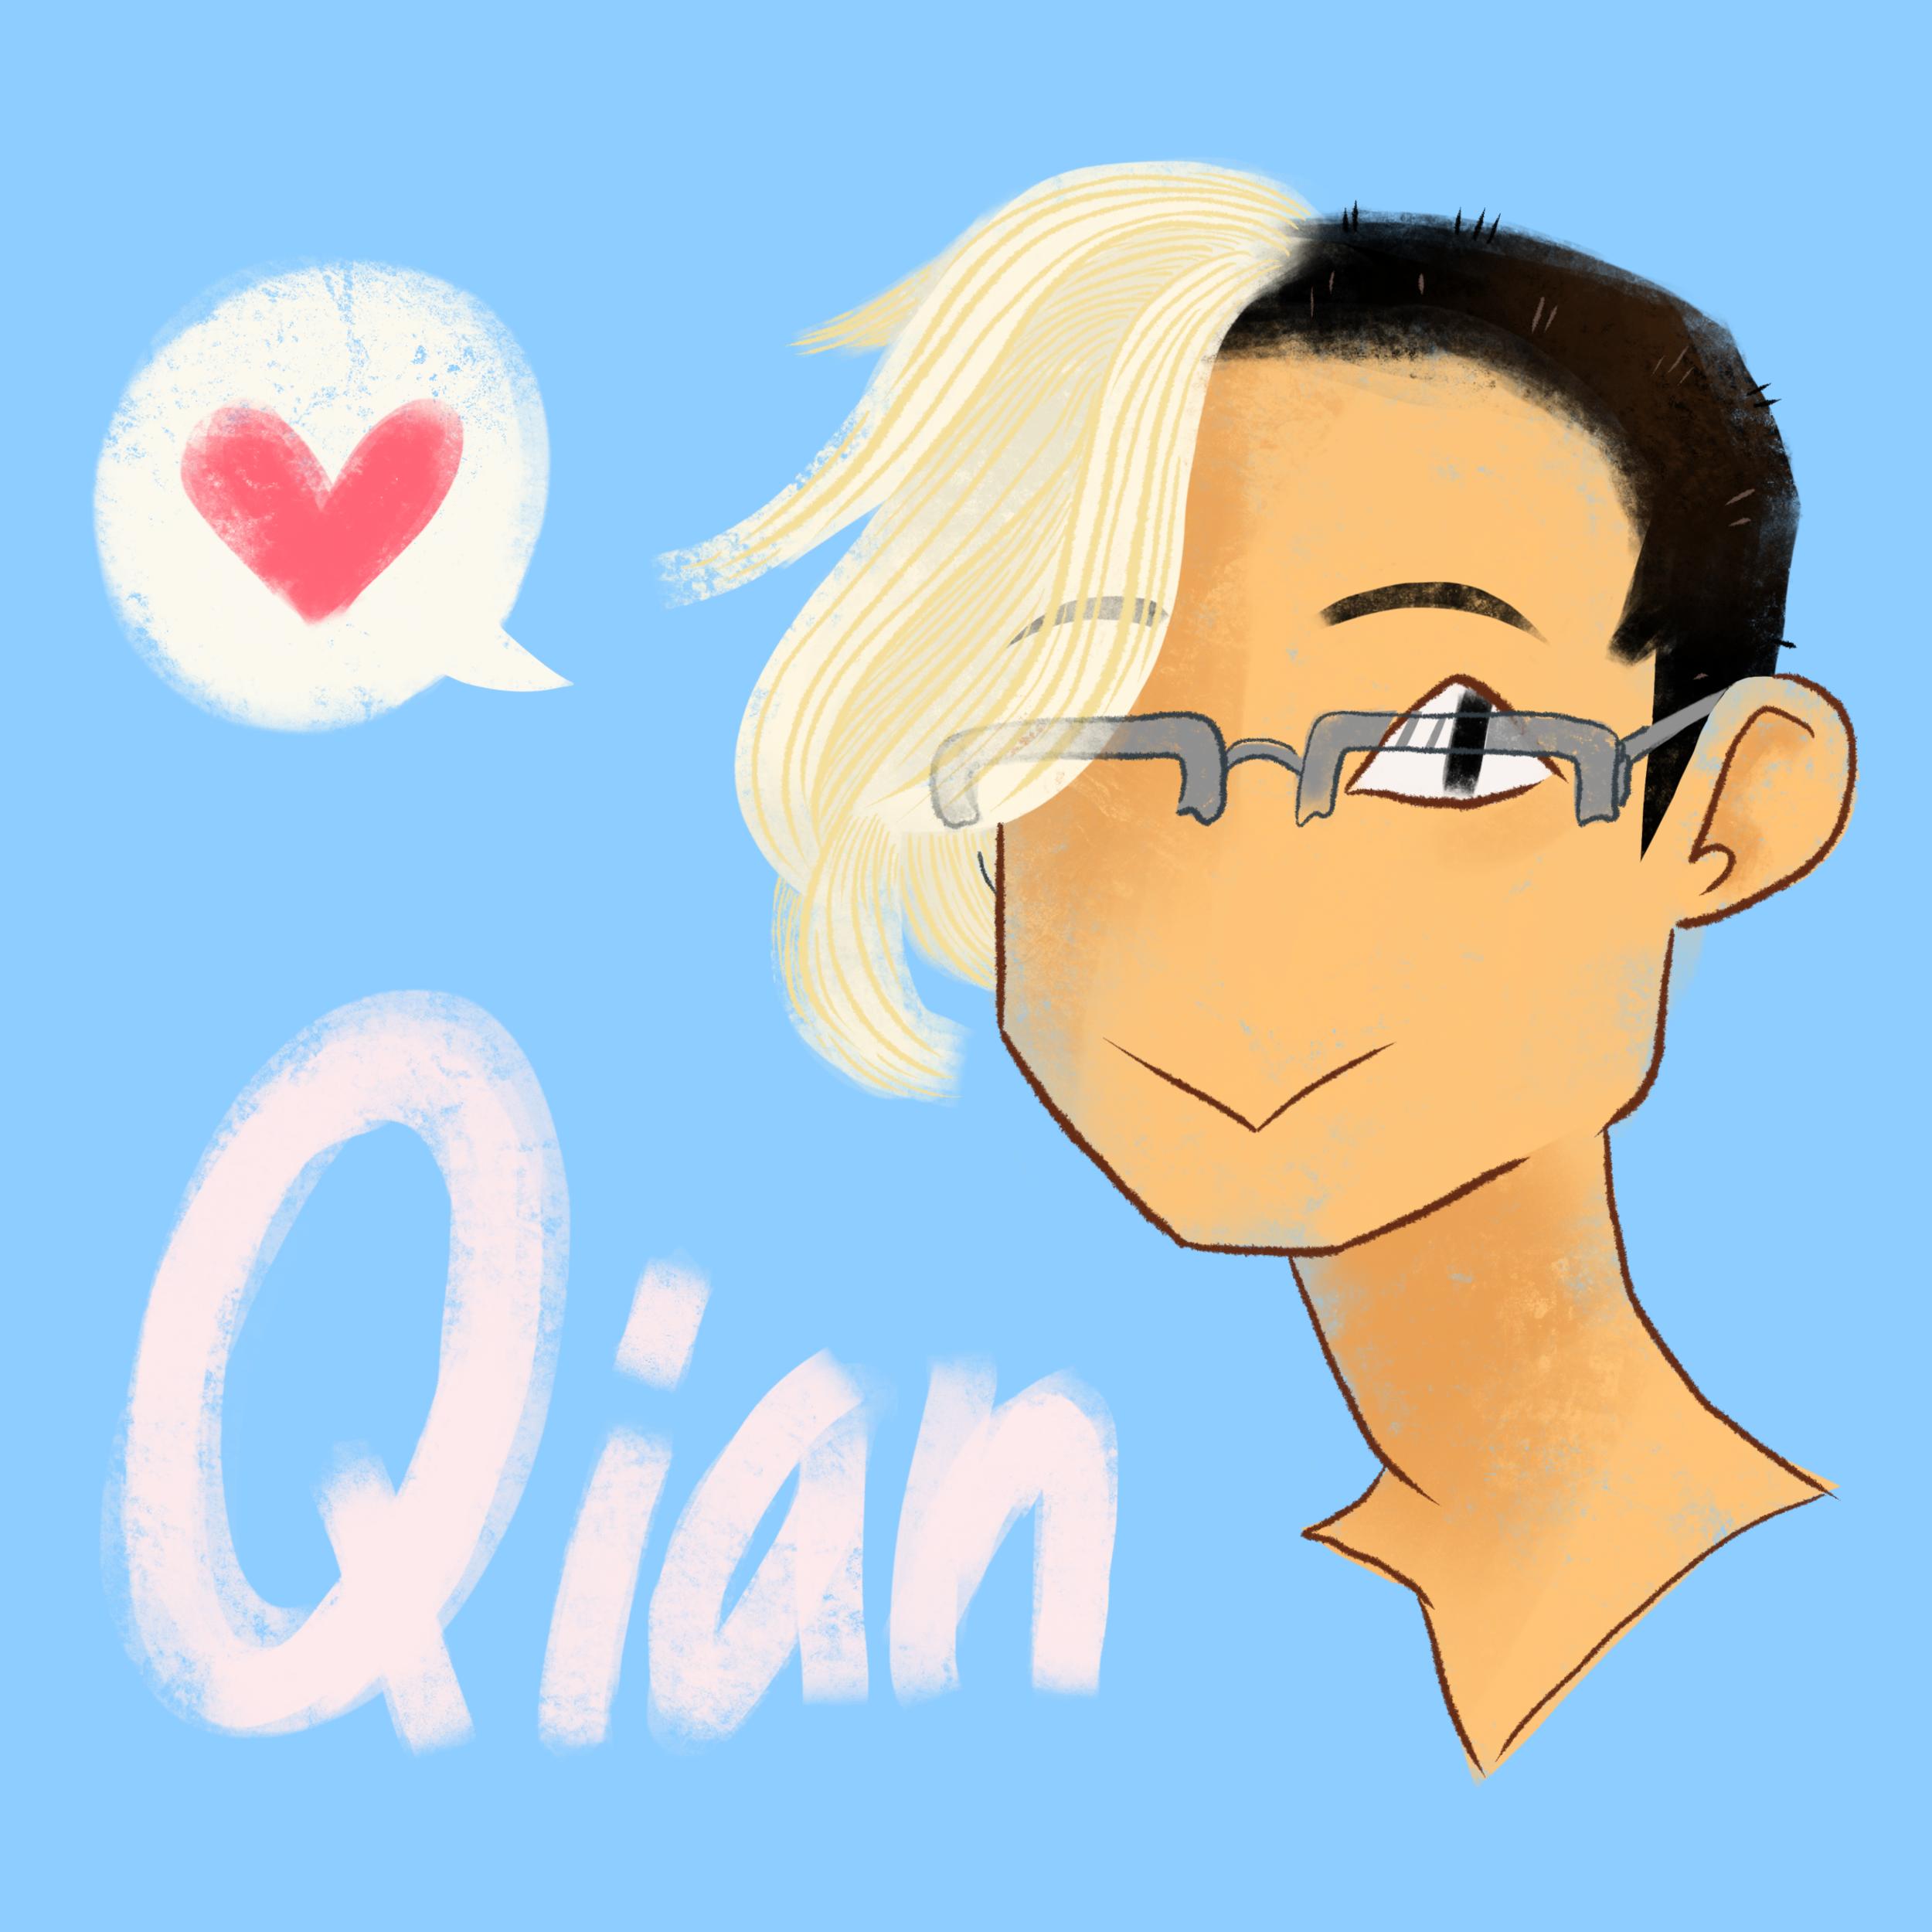 qian profile pic.png